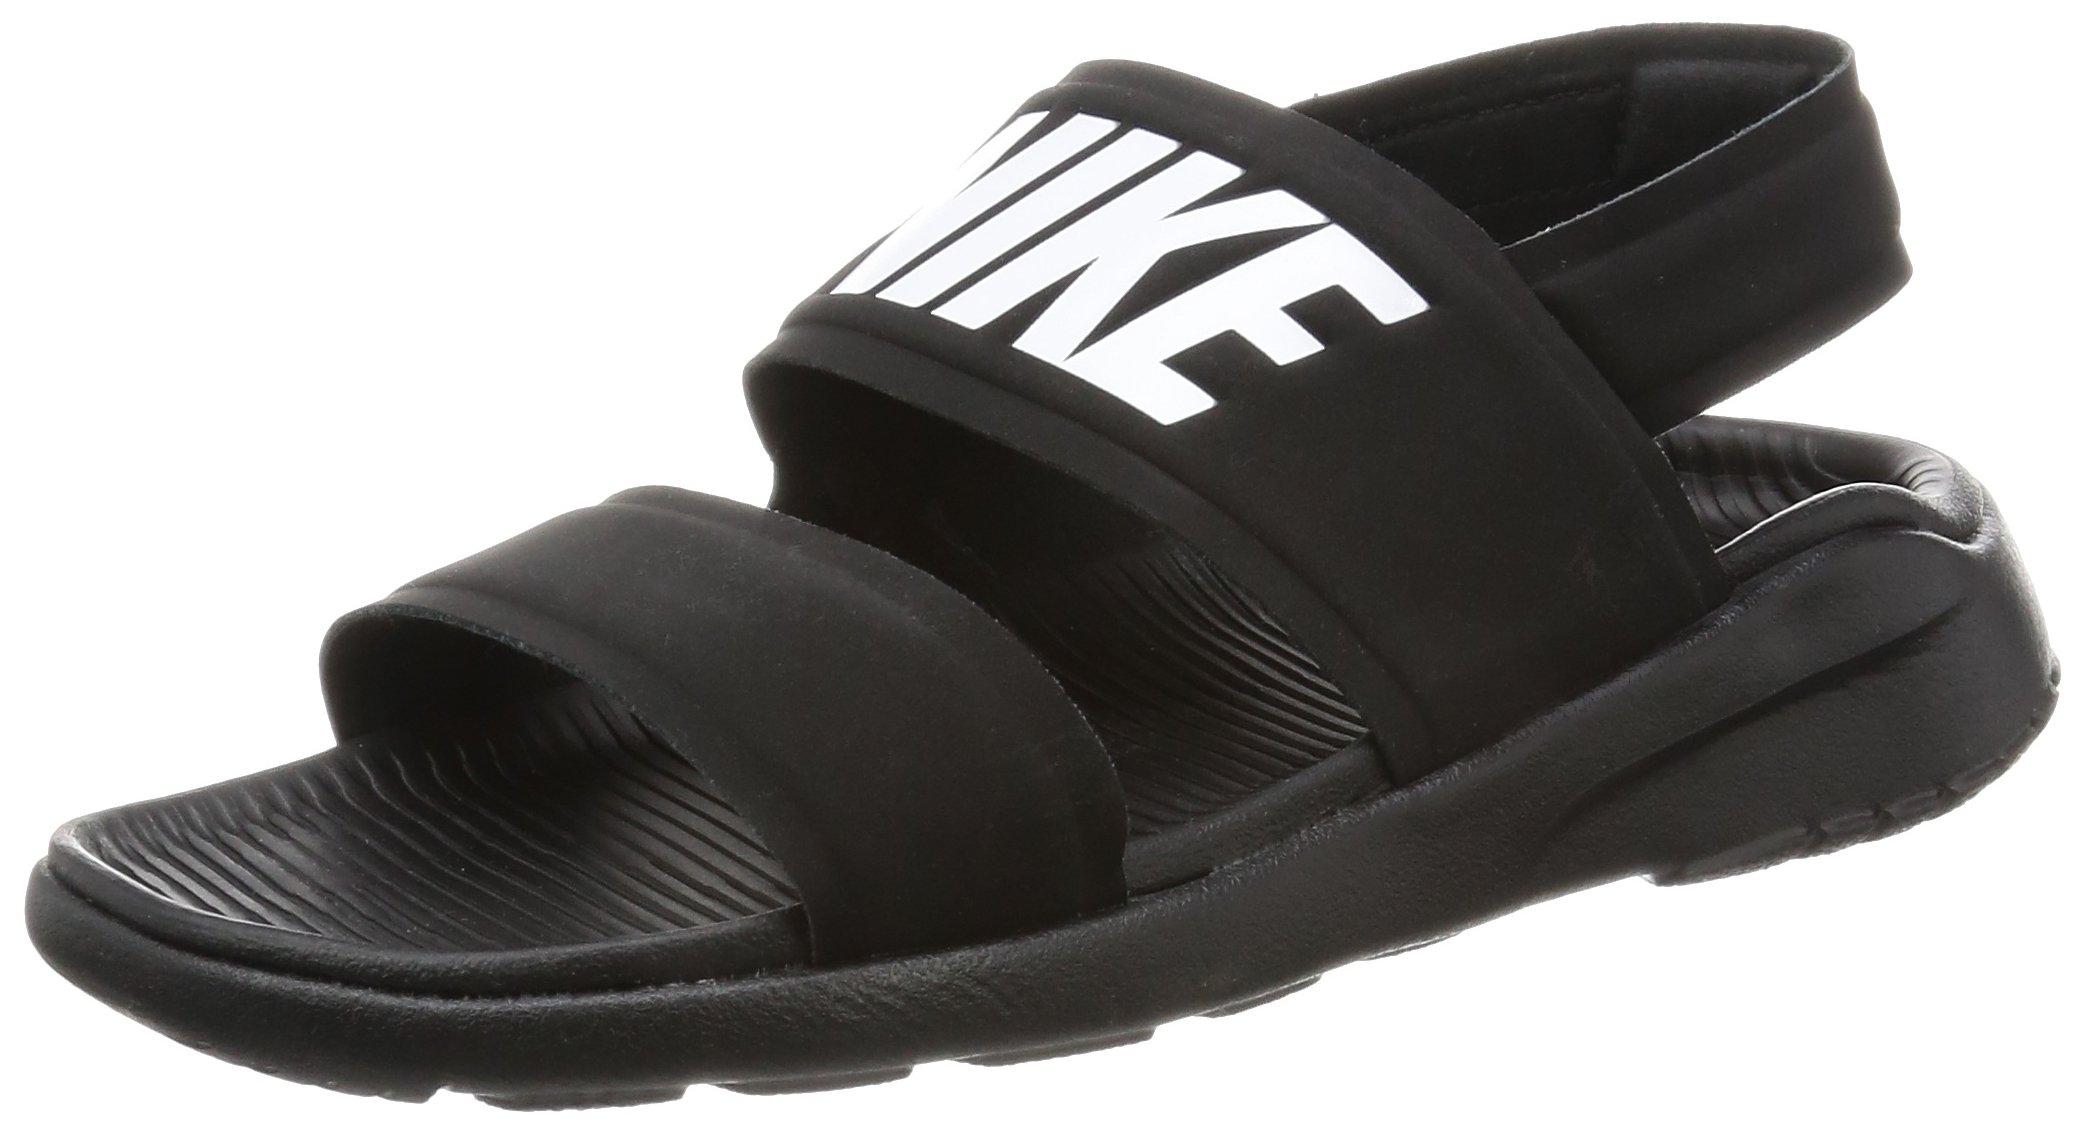 new styles a4670 4381b Galleon - Nike Tanjun Womens Sandal Black White Black 882694-001 (6 B(M) US)